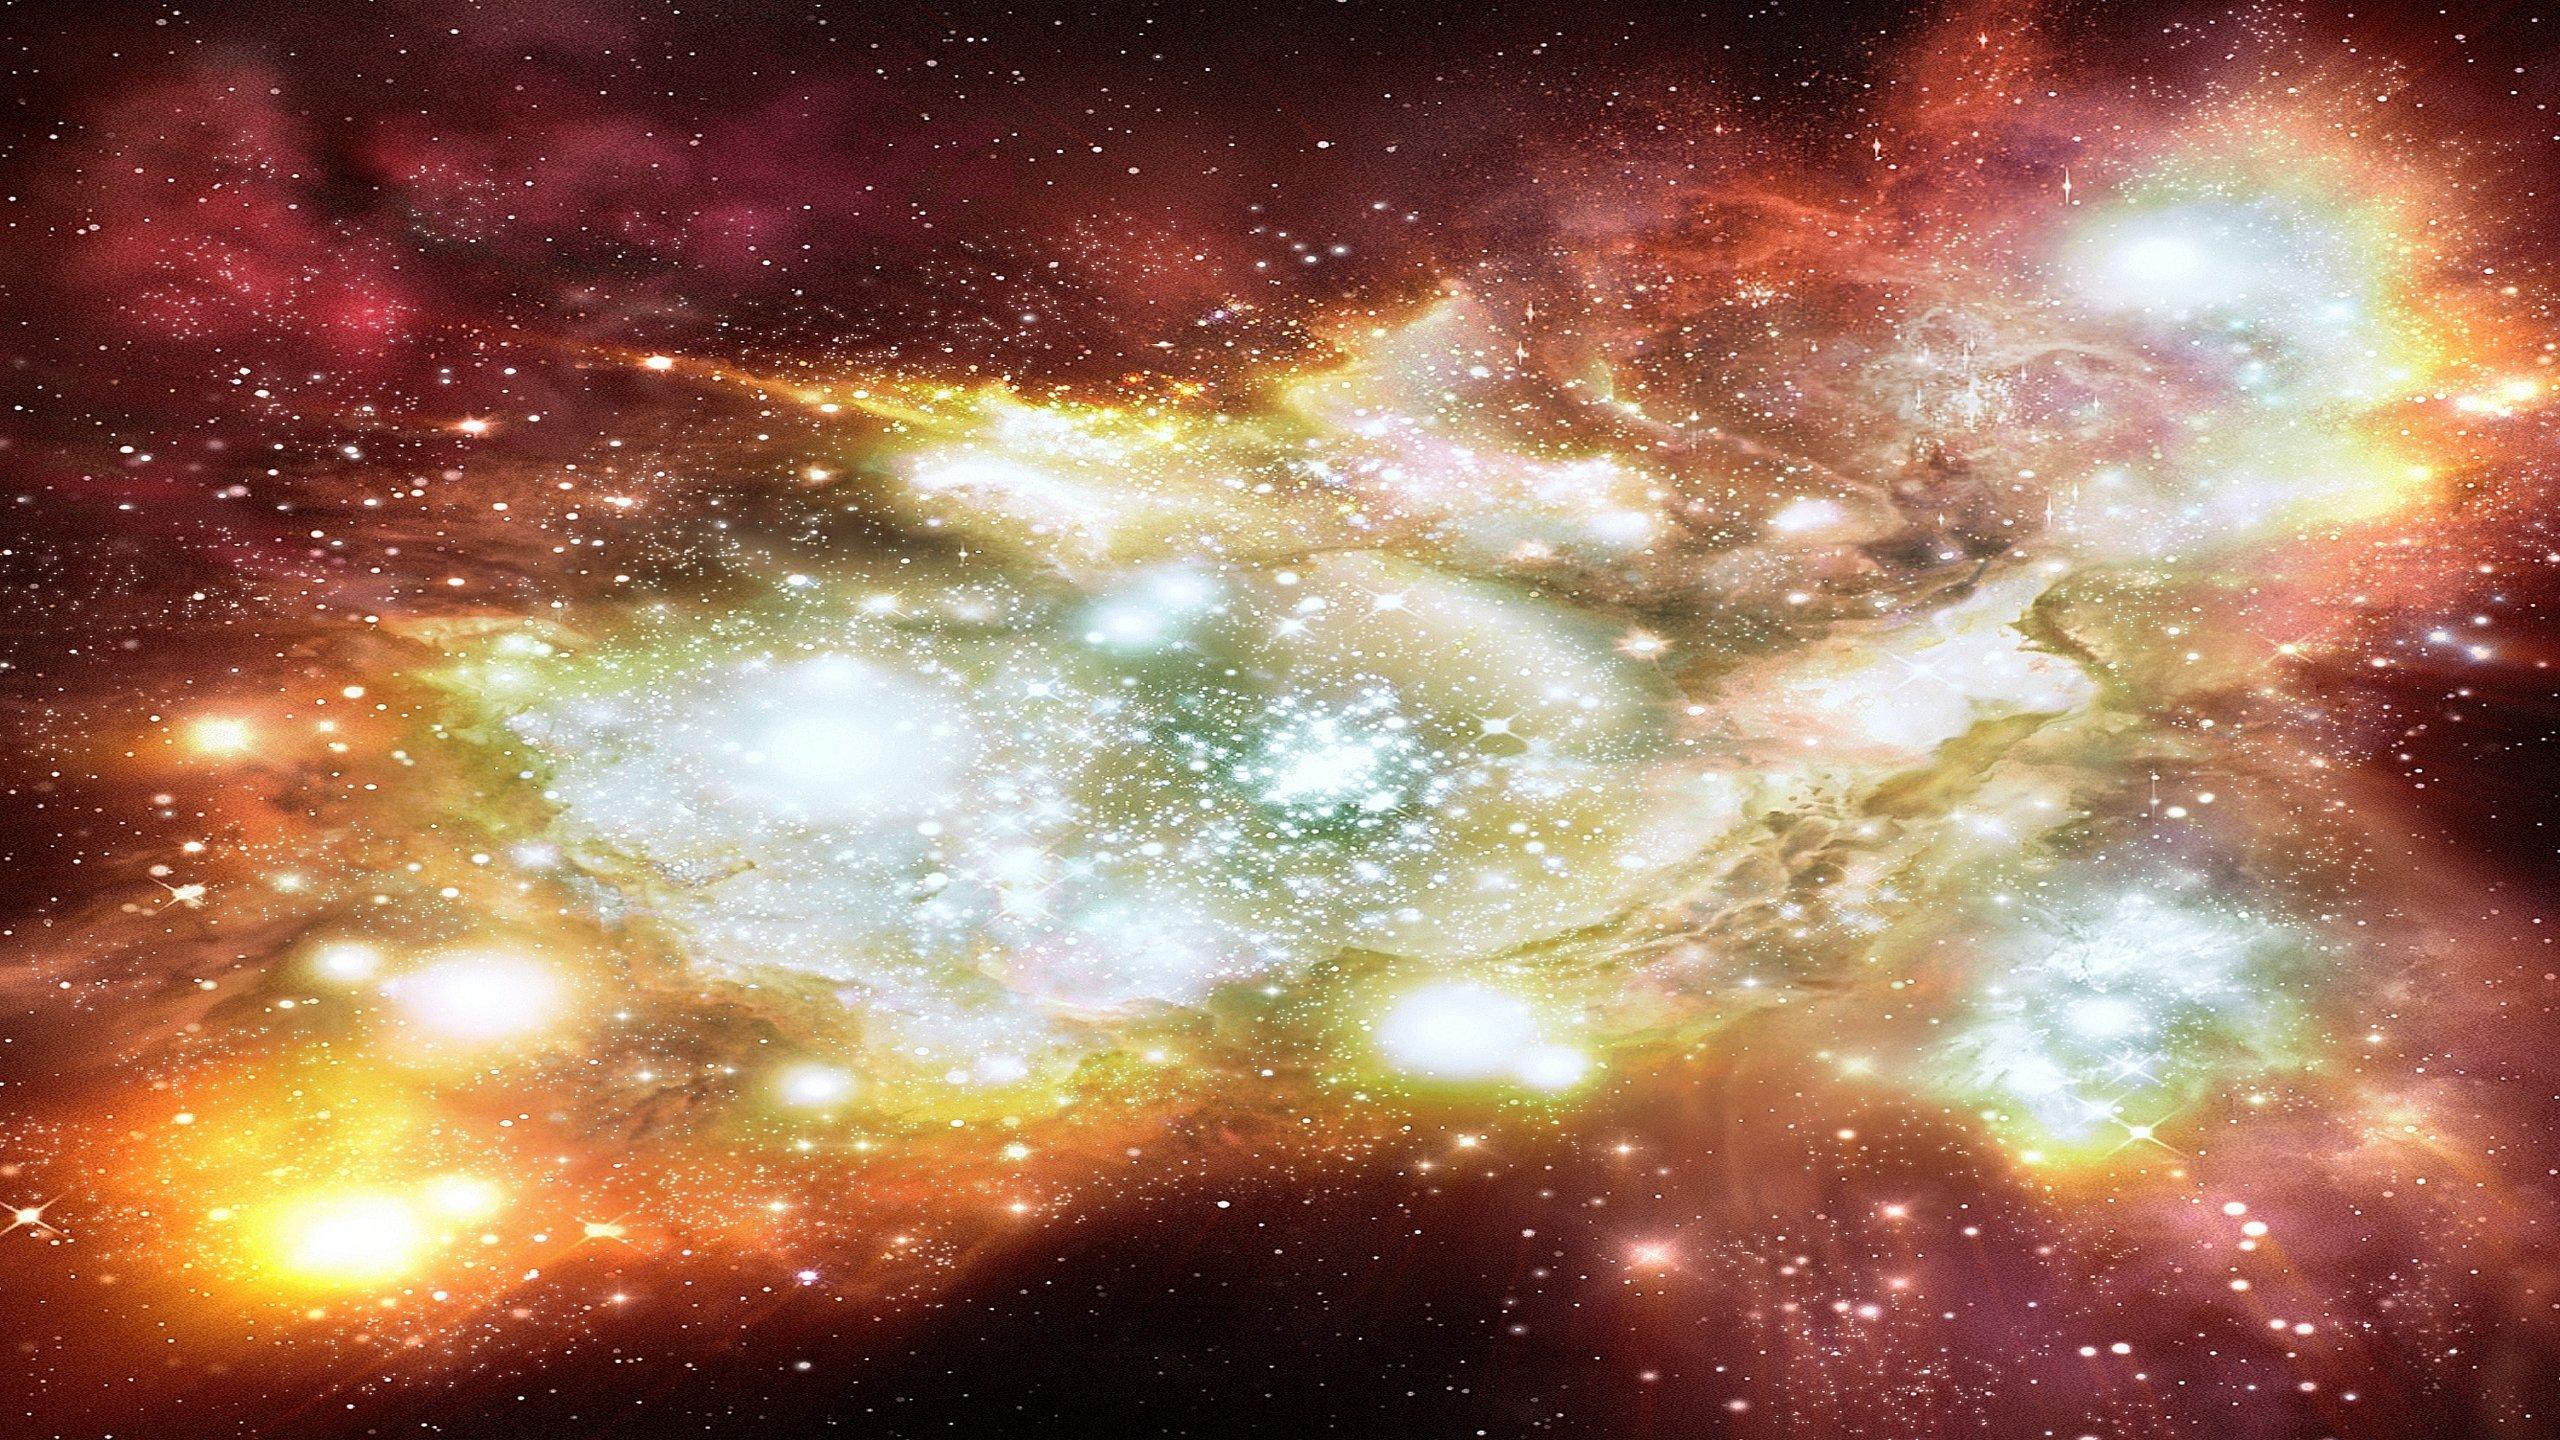 Telescope High Resolution Free Wallpaper Download